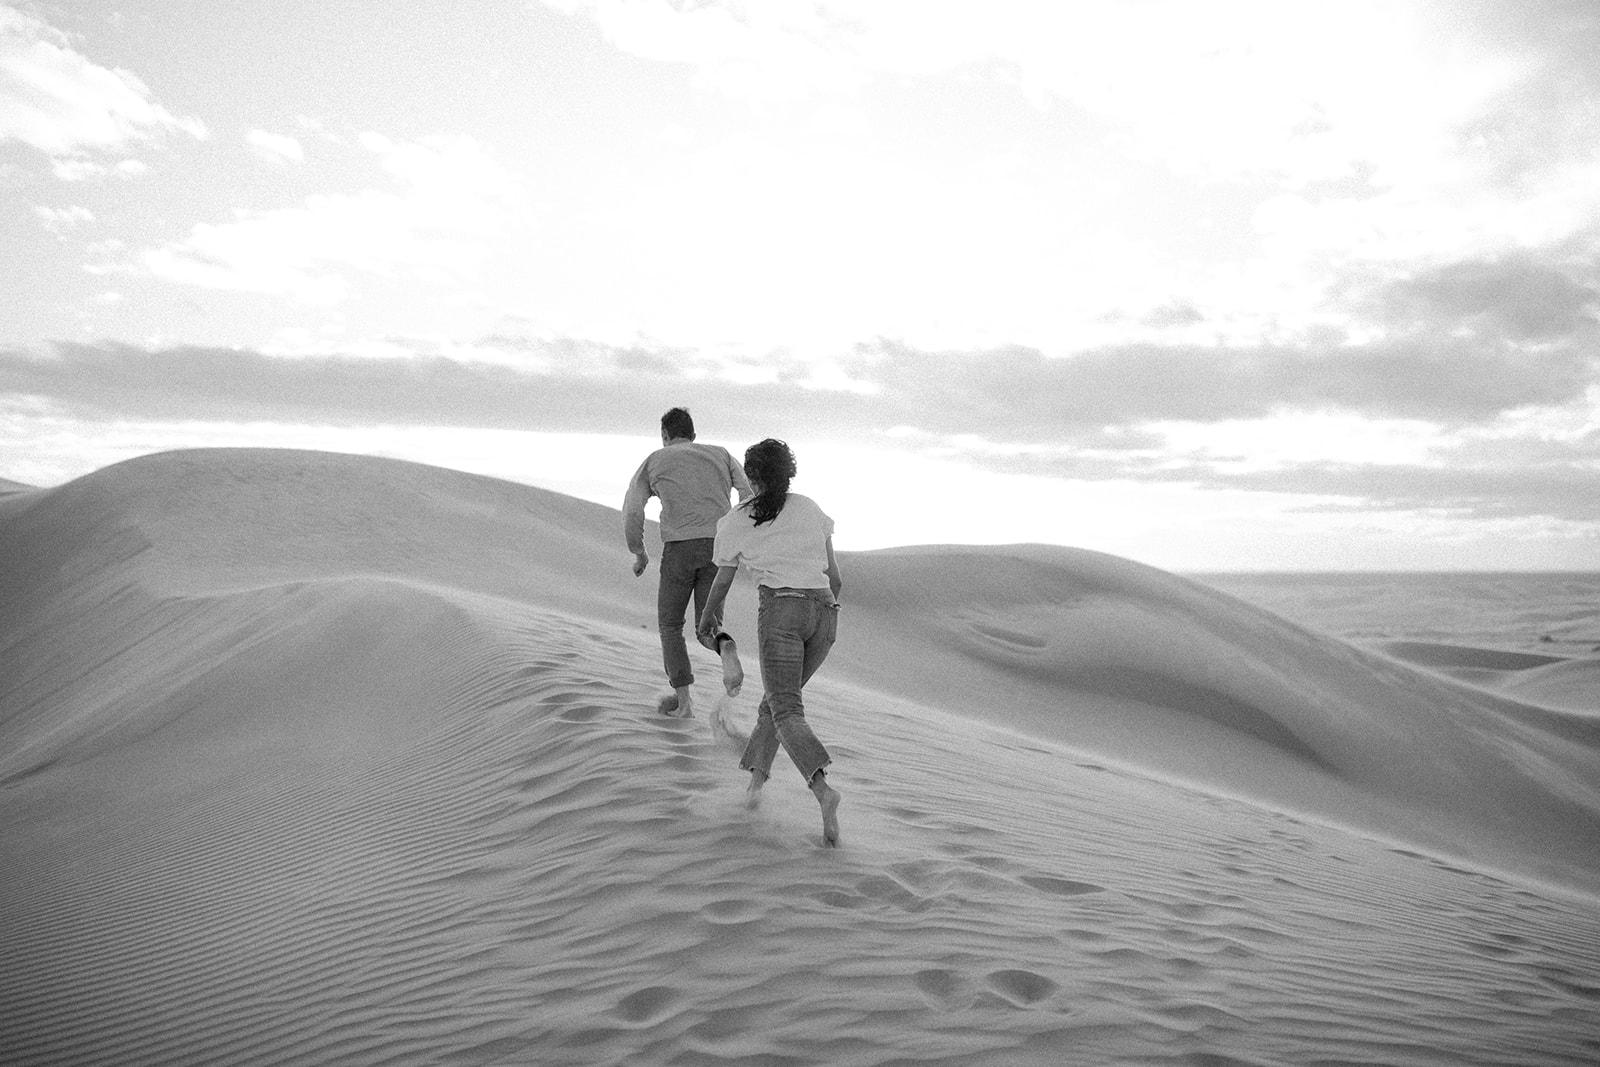 Imperial_Sand_Dunes_Linda_and_Sam_Dawn_Charles_Photographer-4.jpg